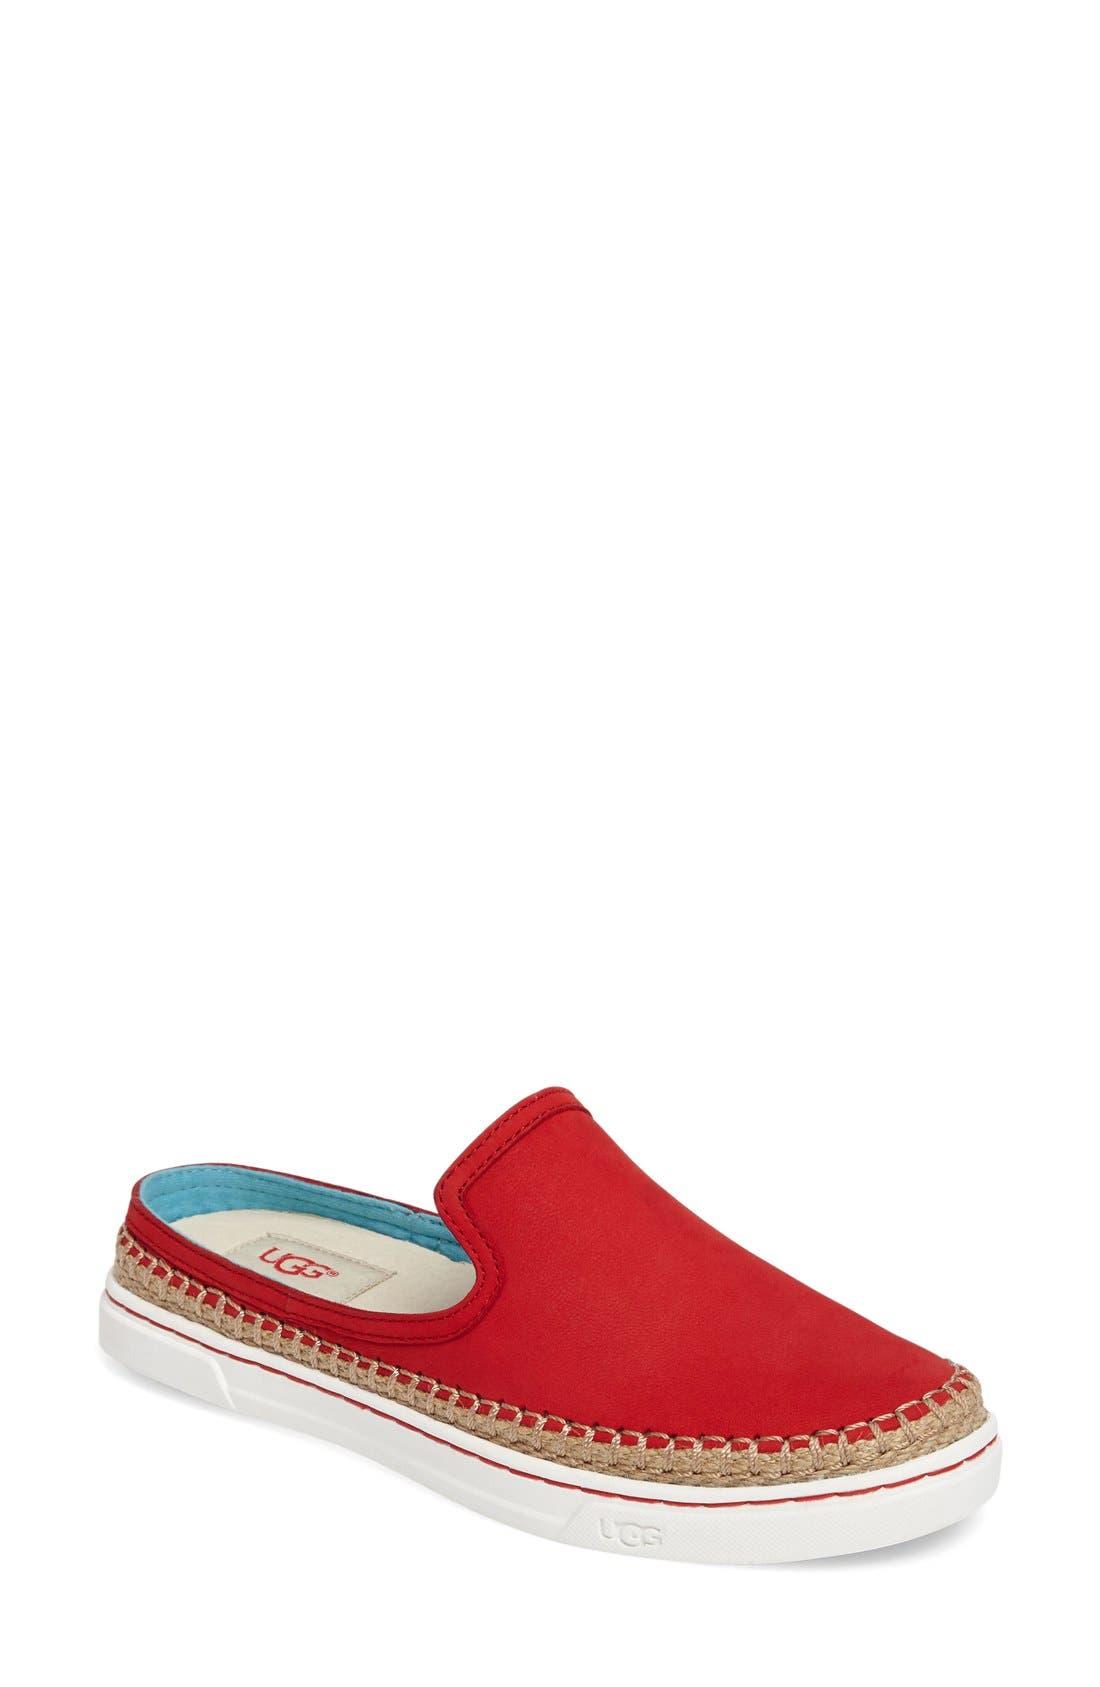 Main Image - UGG® 'Caleel' Slip-On Sneaker (Women)